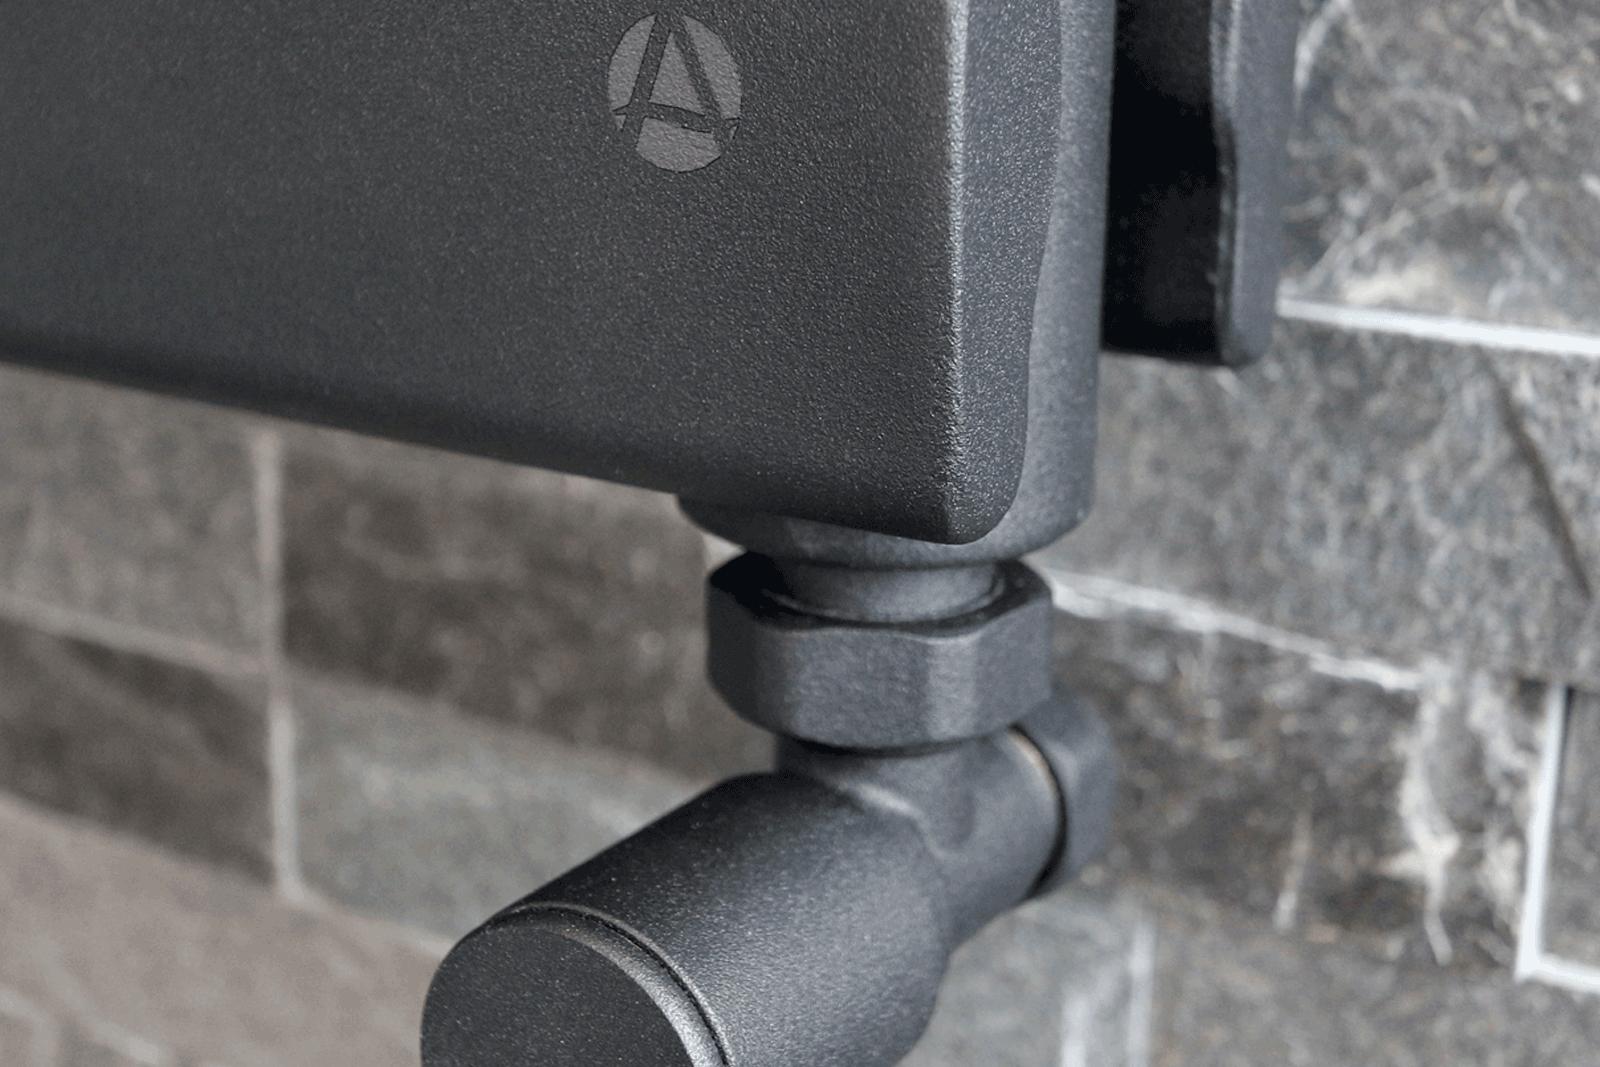 Aqualla valve